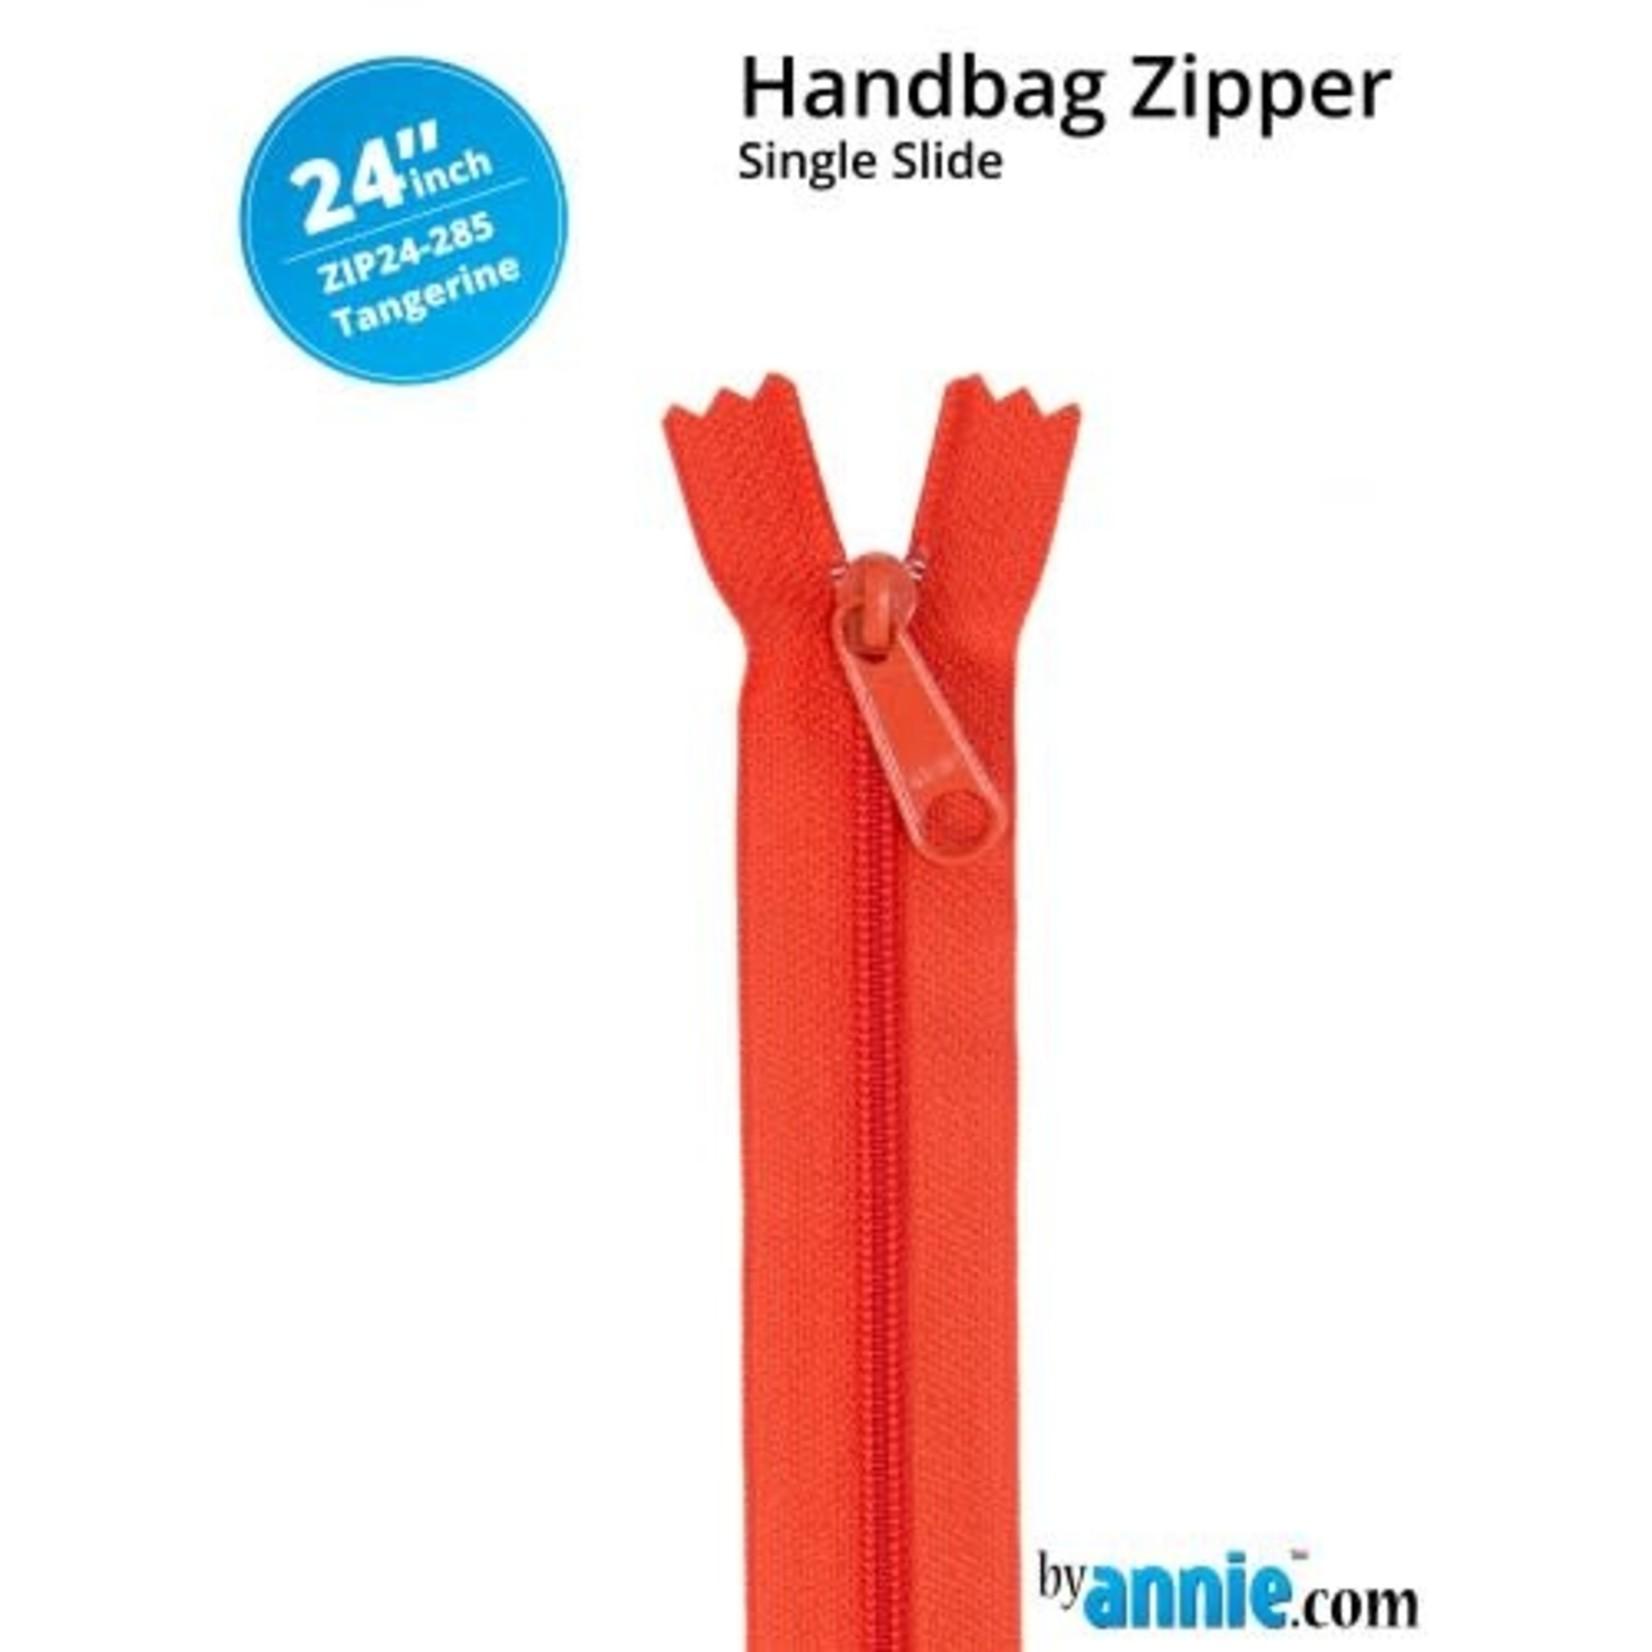 By Annie Single Slide Handbag Zipper 24'' Yellow/Orange